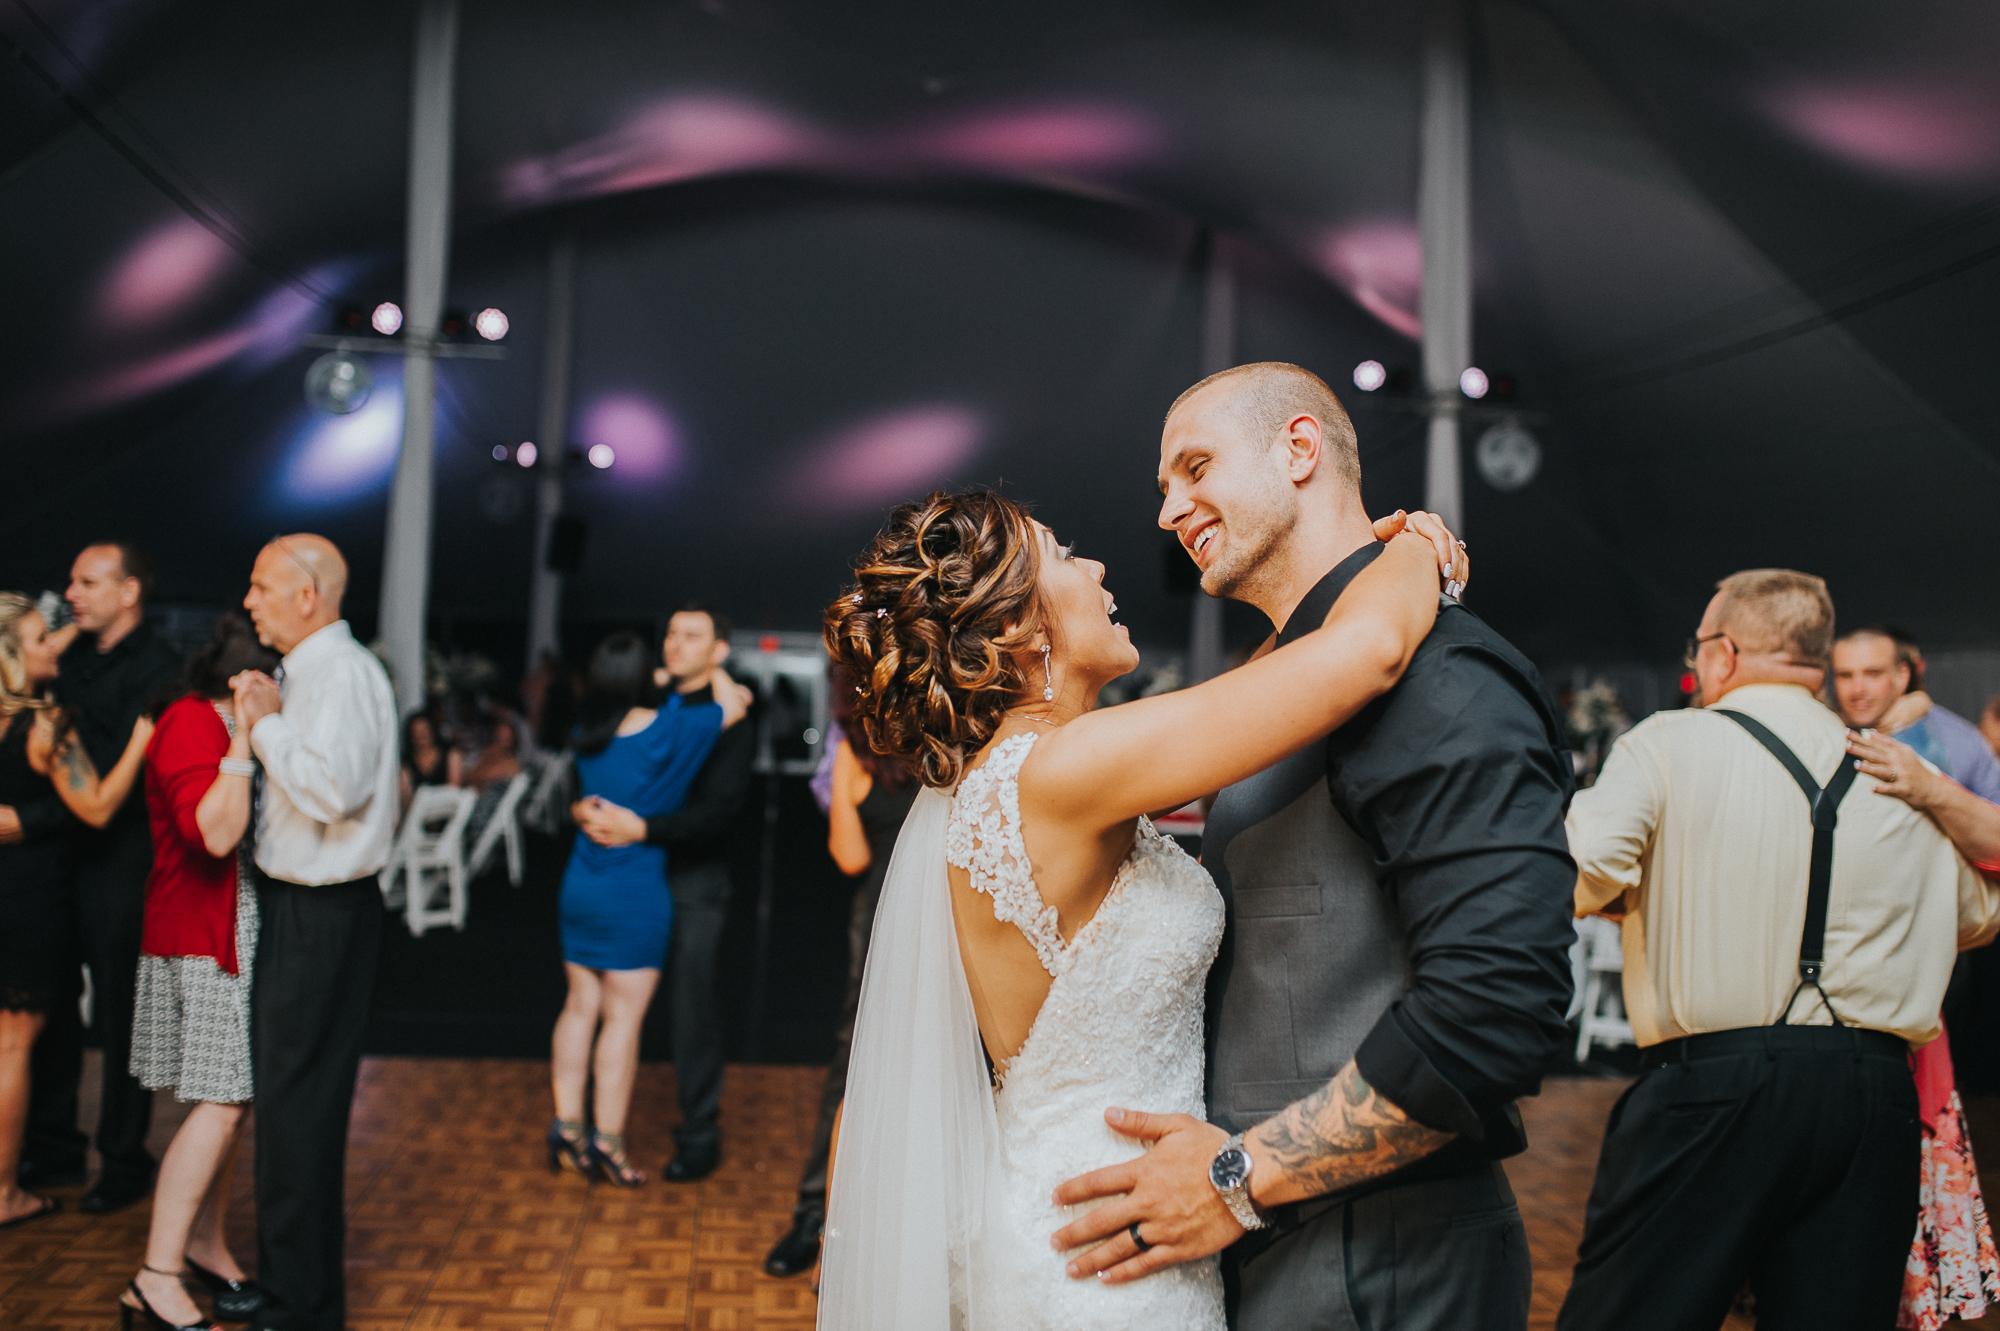 Christina-and-Gene-Wedding-Marla-Rain-Photography-607.jpg